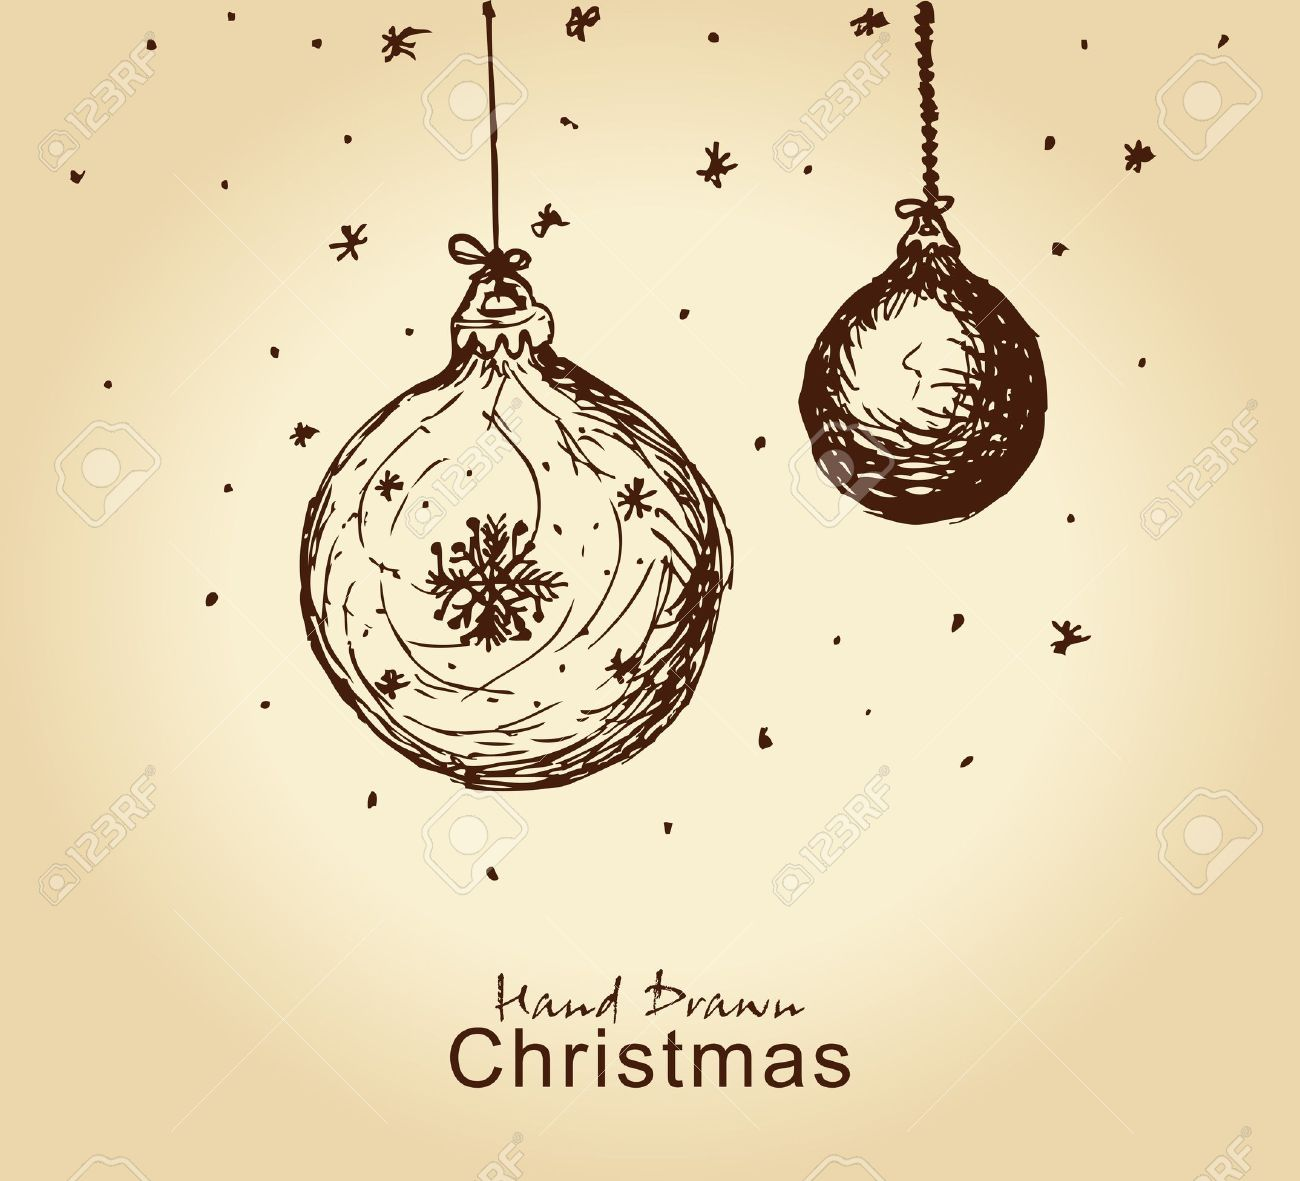 Hand Drawn Vintage Christmas Balls For Xmas Design Stock Vector